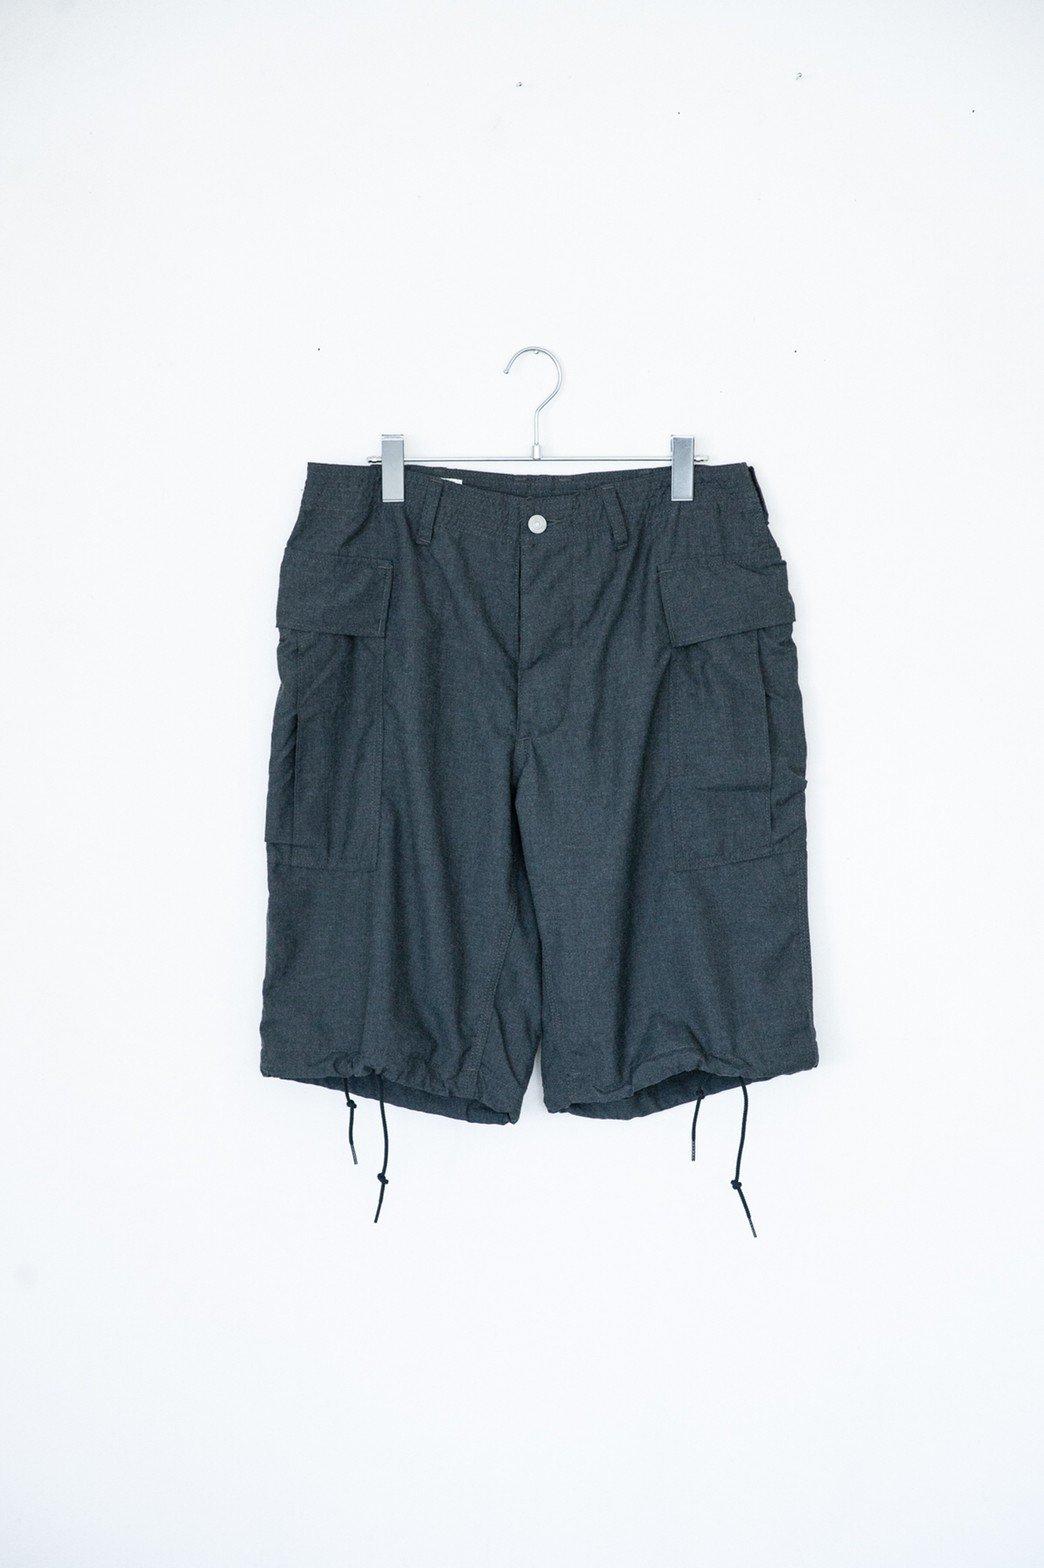 SASSAFRAS / Trug Fatigue Pants 1/2